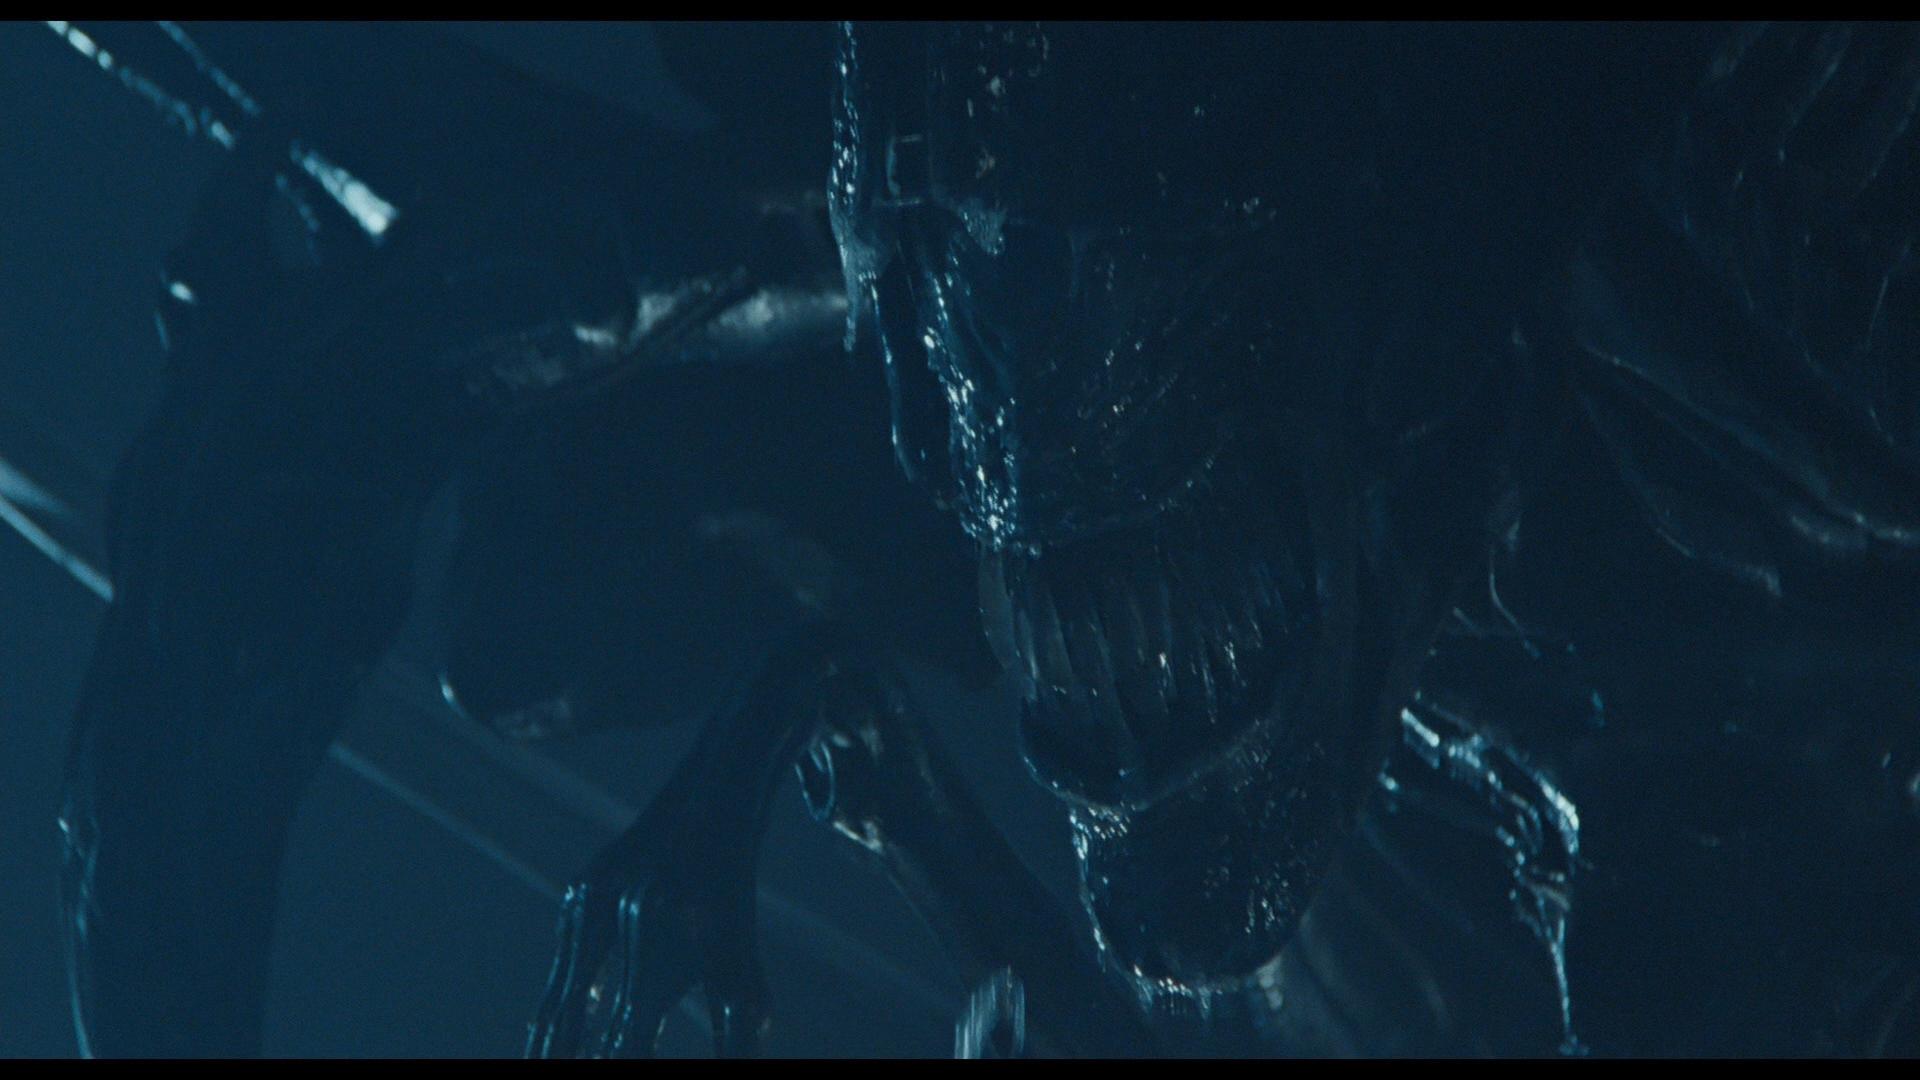 ALIENS (1986) - Full-size Promotional Alien Queen - Image 38 of 38